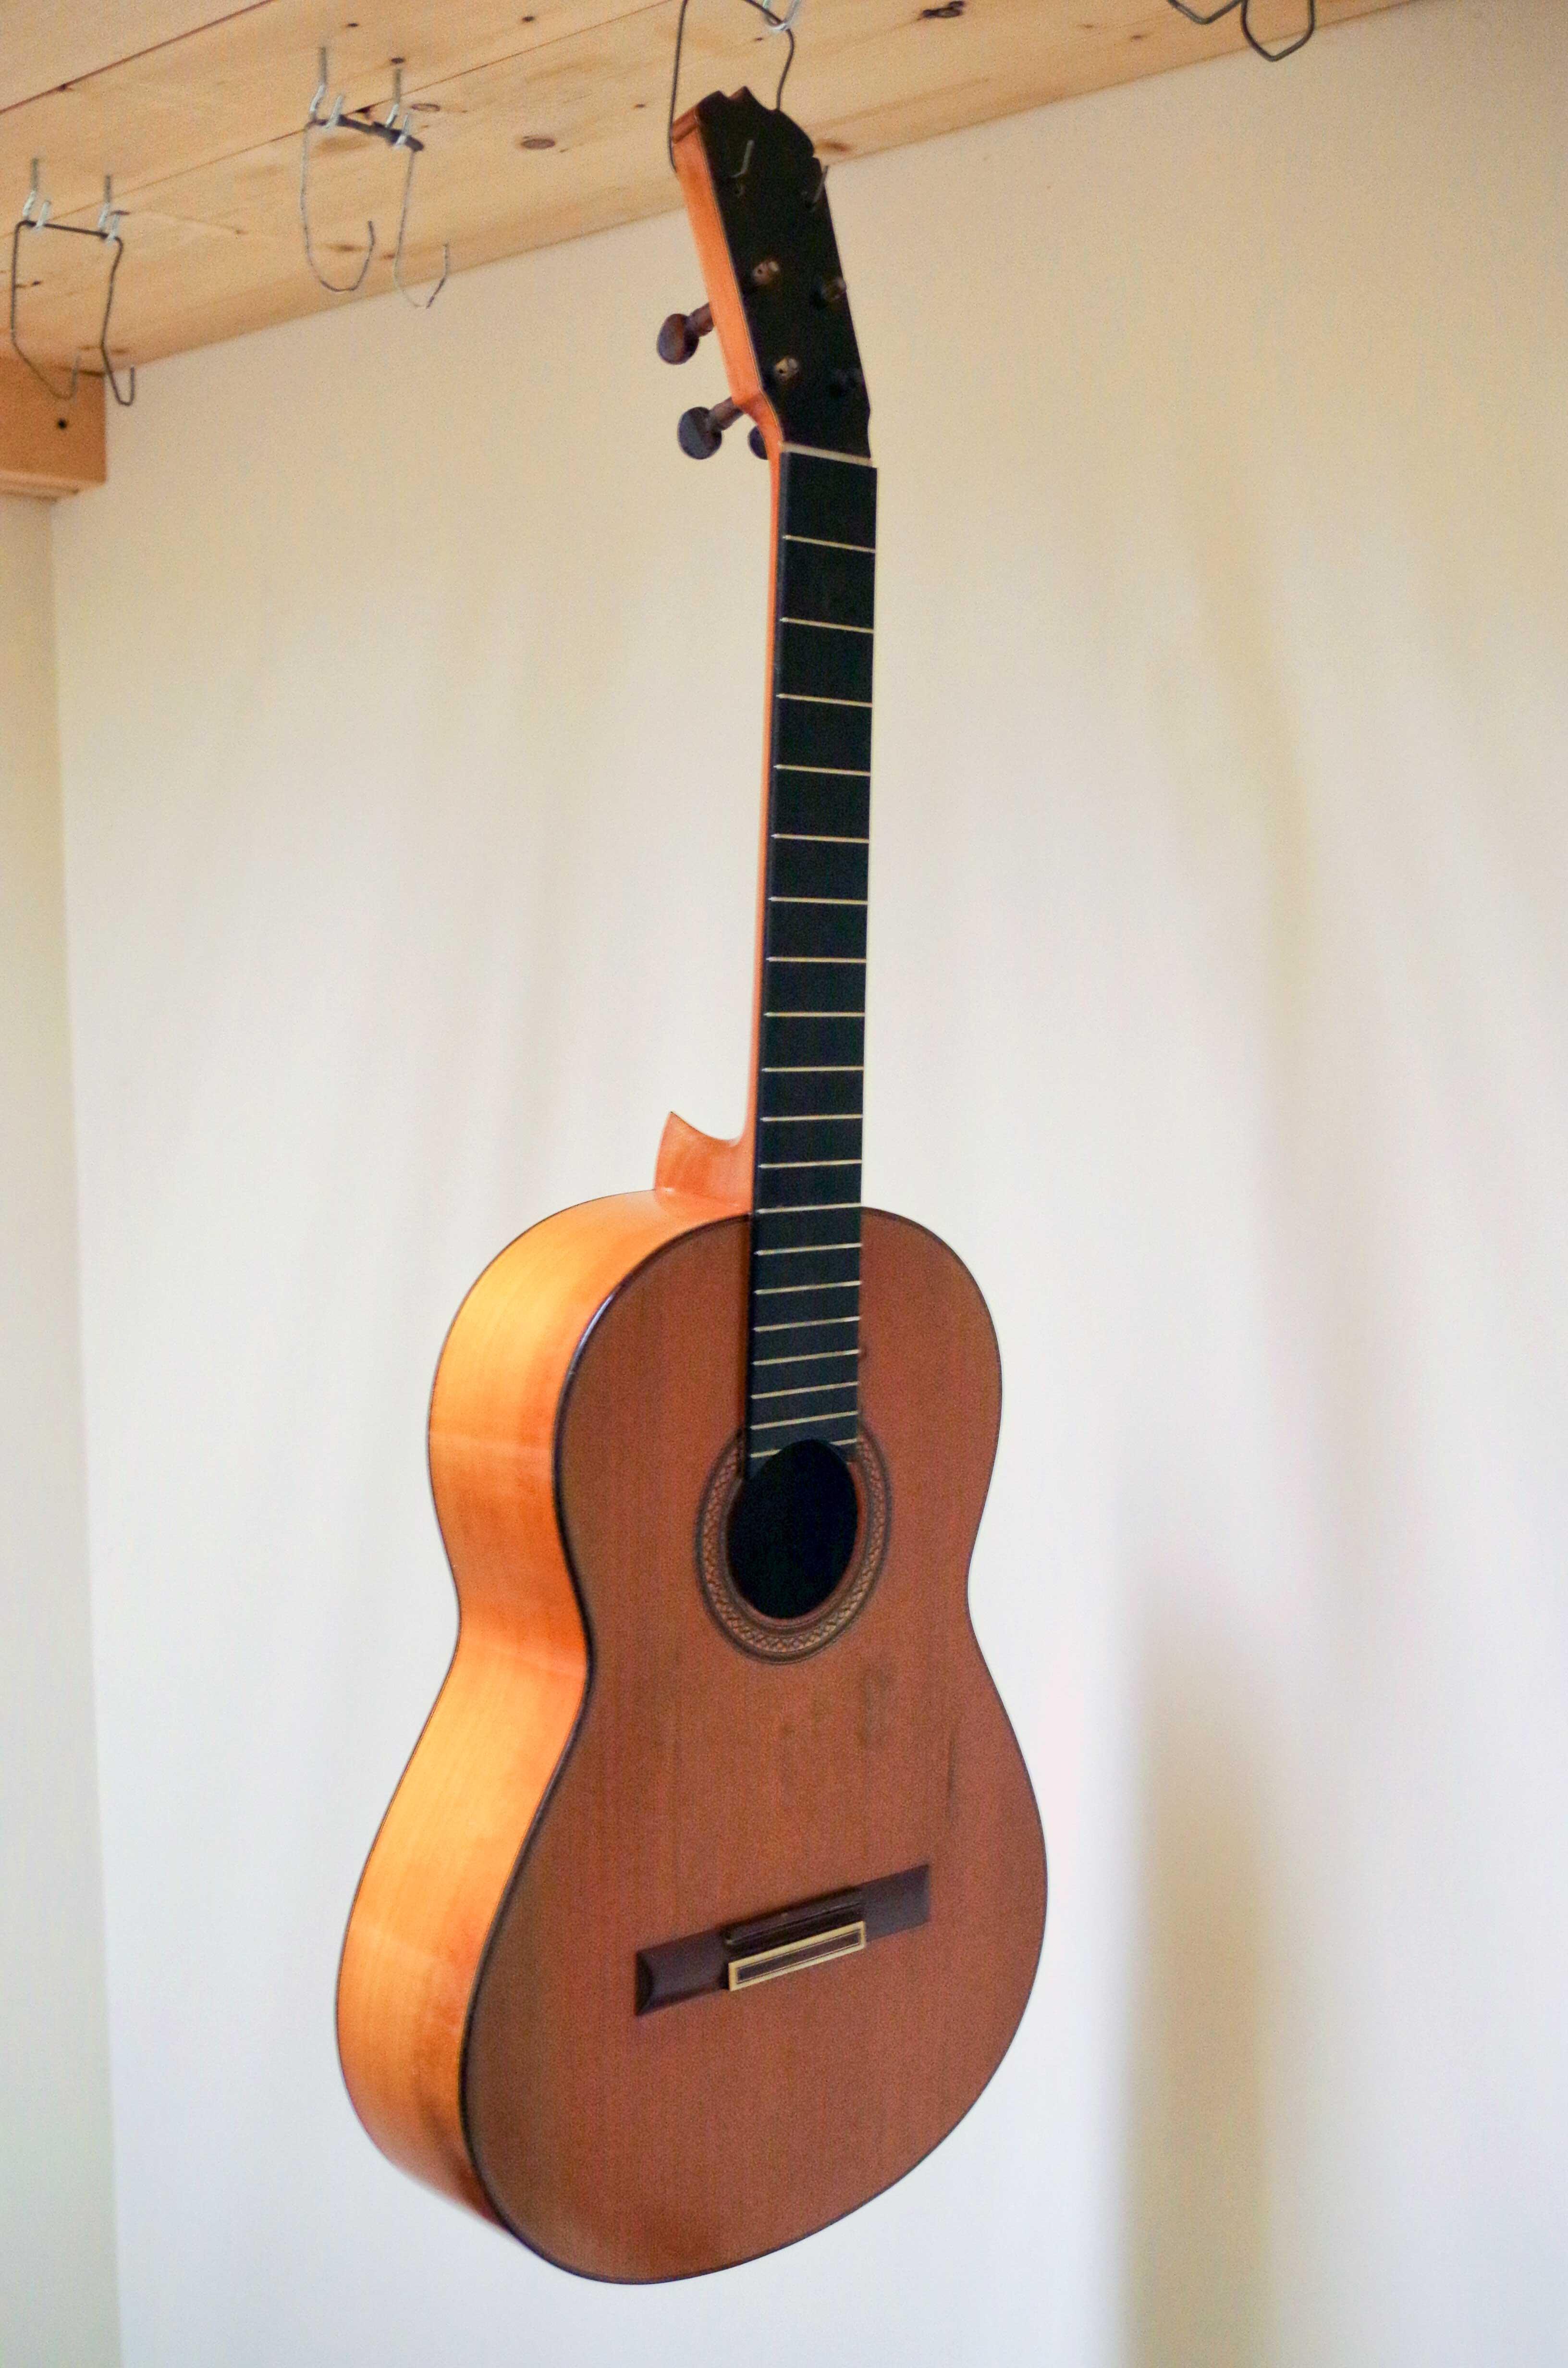 Aaron Green Groton Guitar Maker Groton Herald